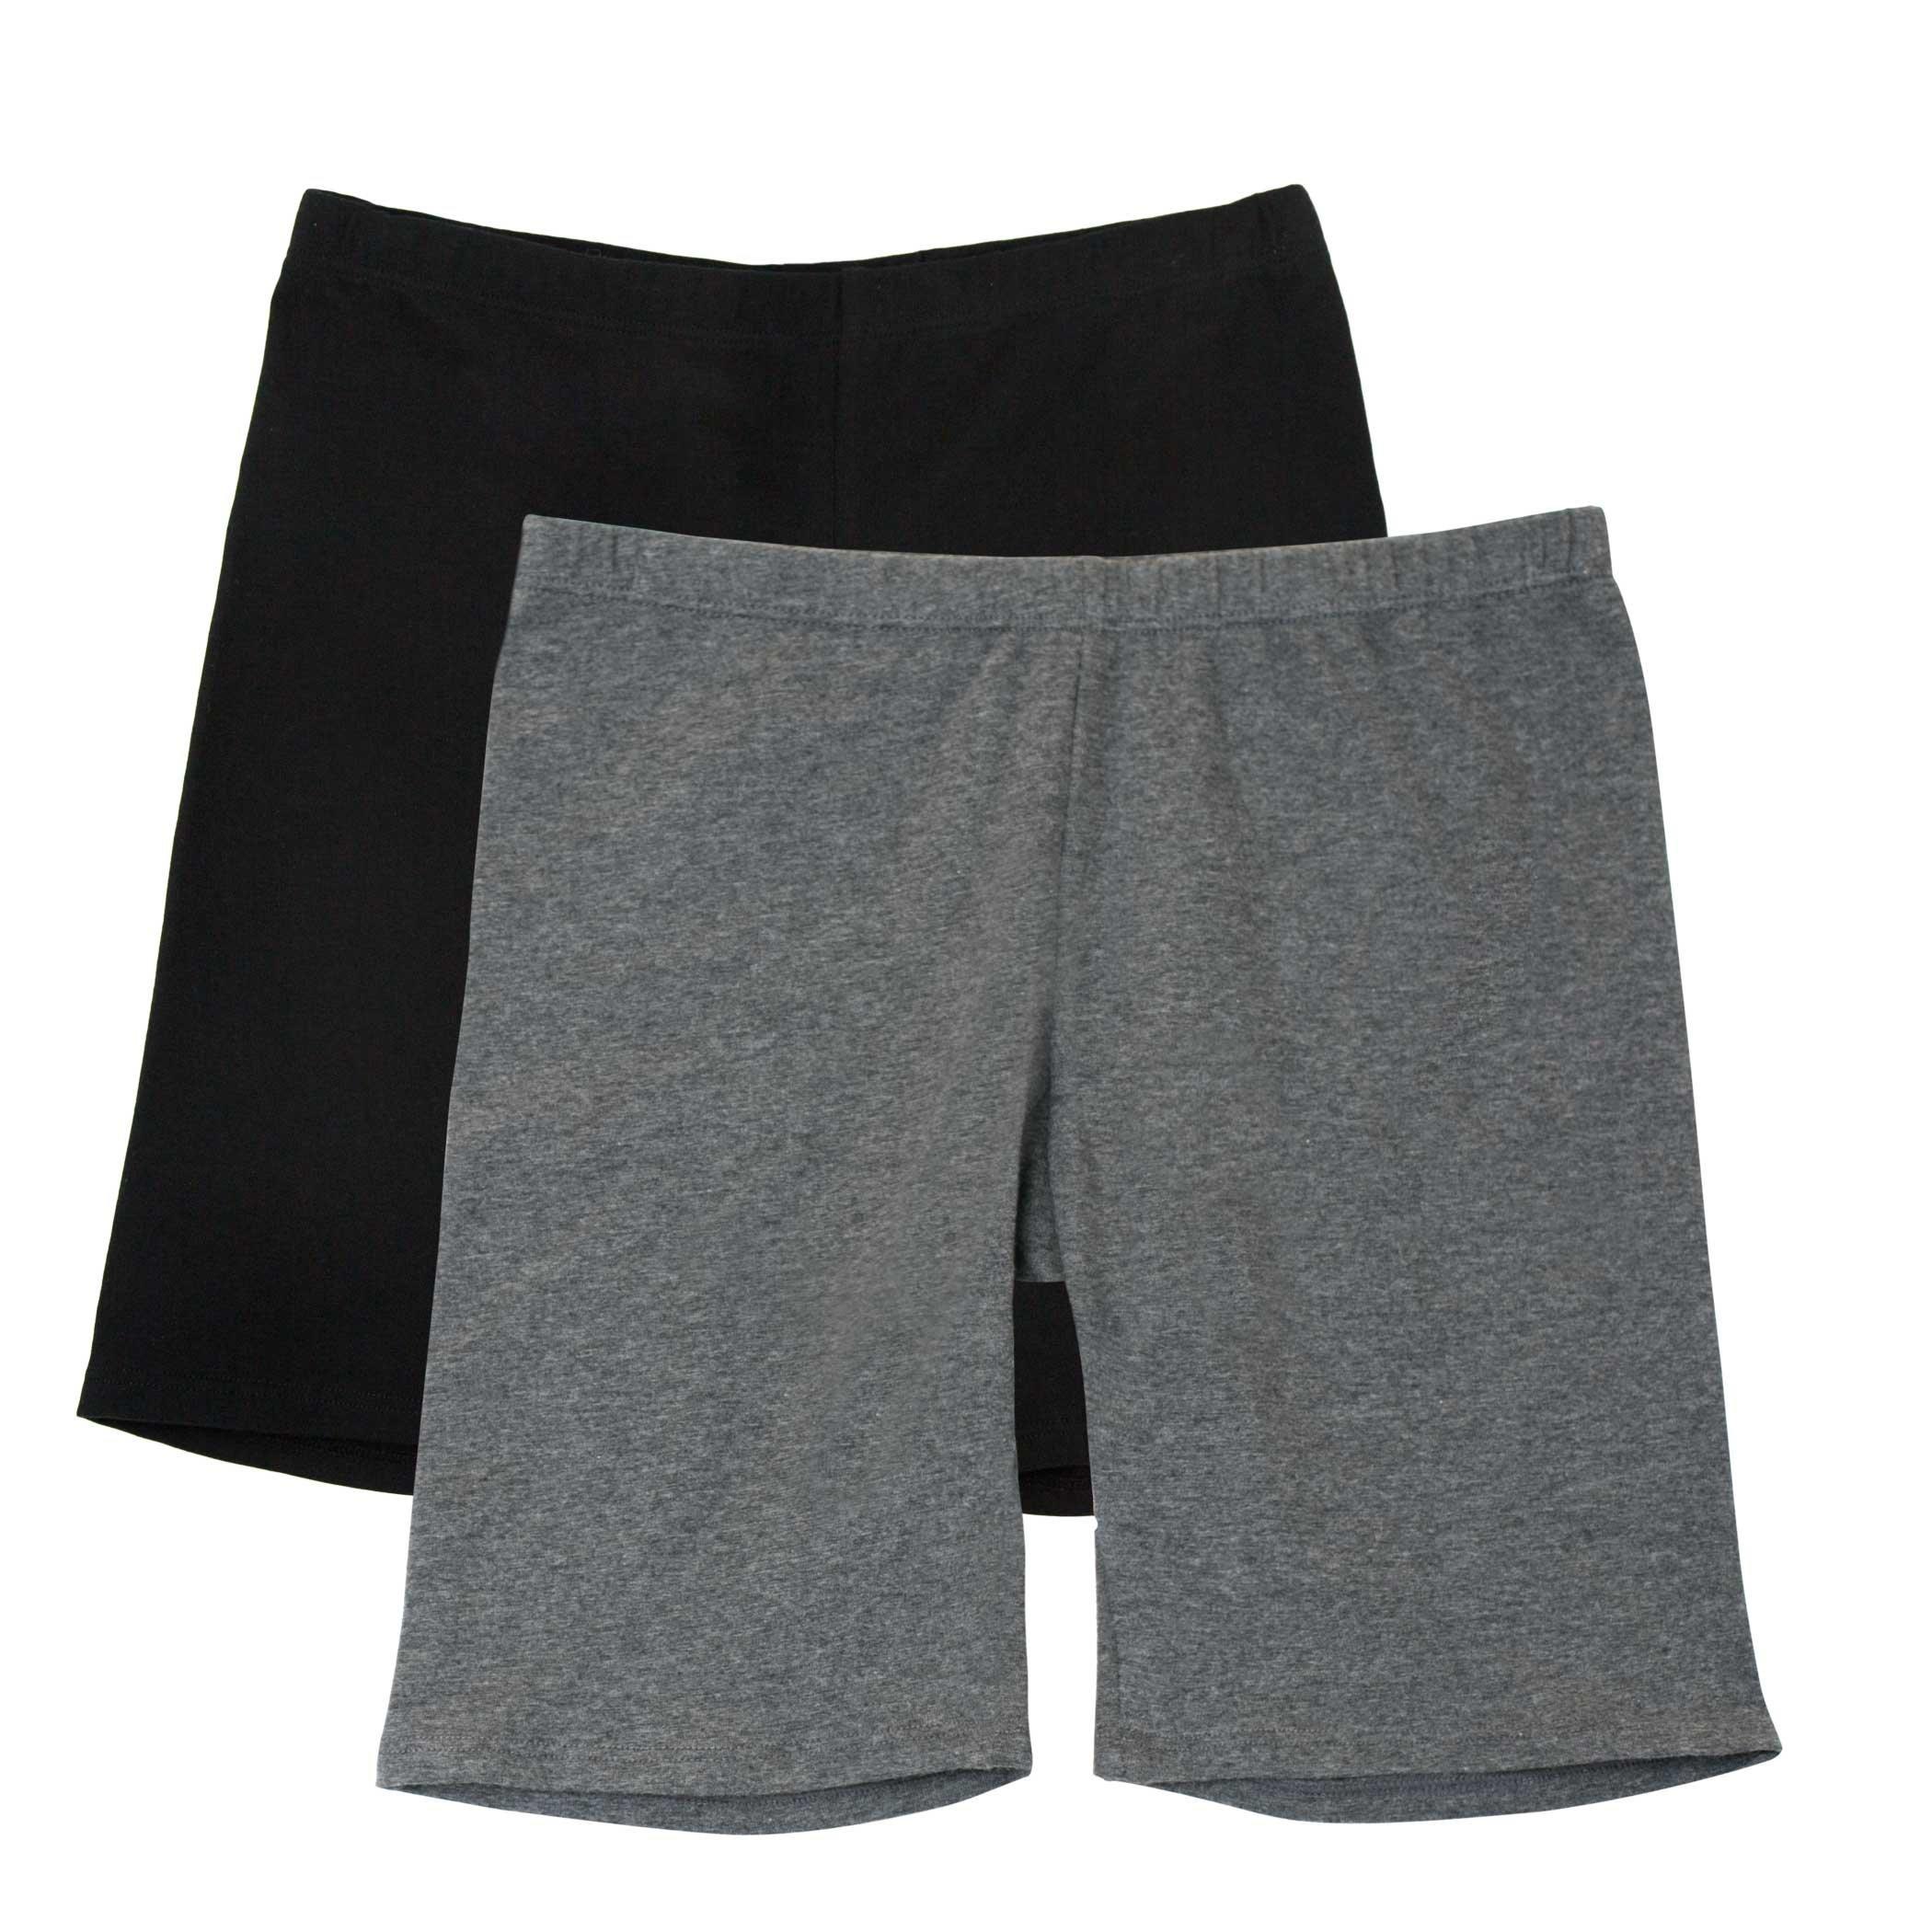 Fruit of the Loom Big Girls' Cotton Under-Skirt Long Short 2 Pack, Black/Charcoal, X-Large